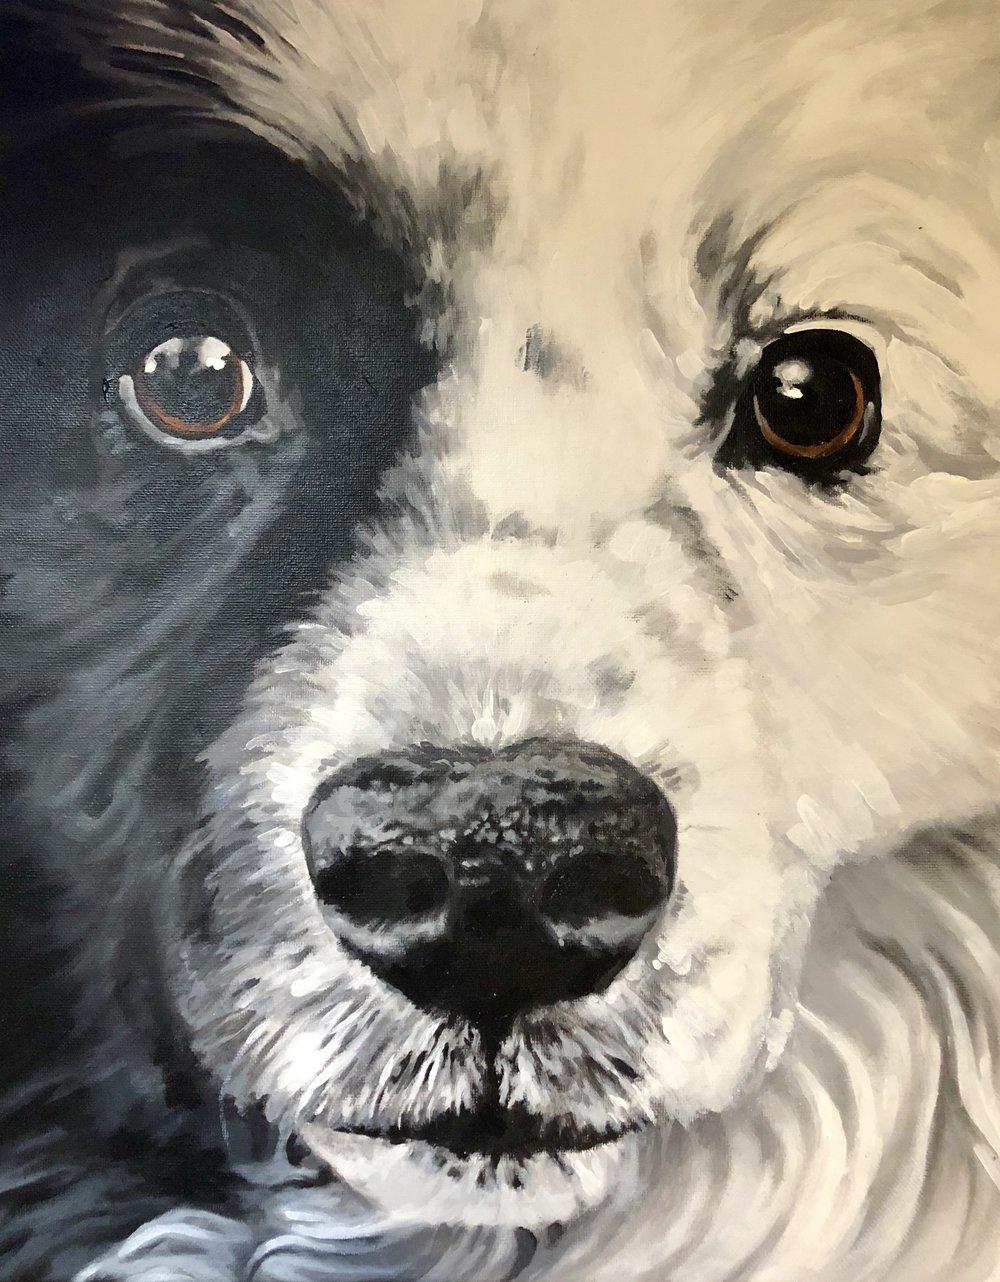 Artwork commissioned by SASLLC to Artist Dawn Pogany